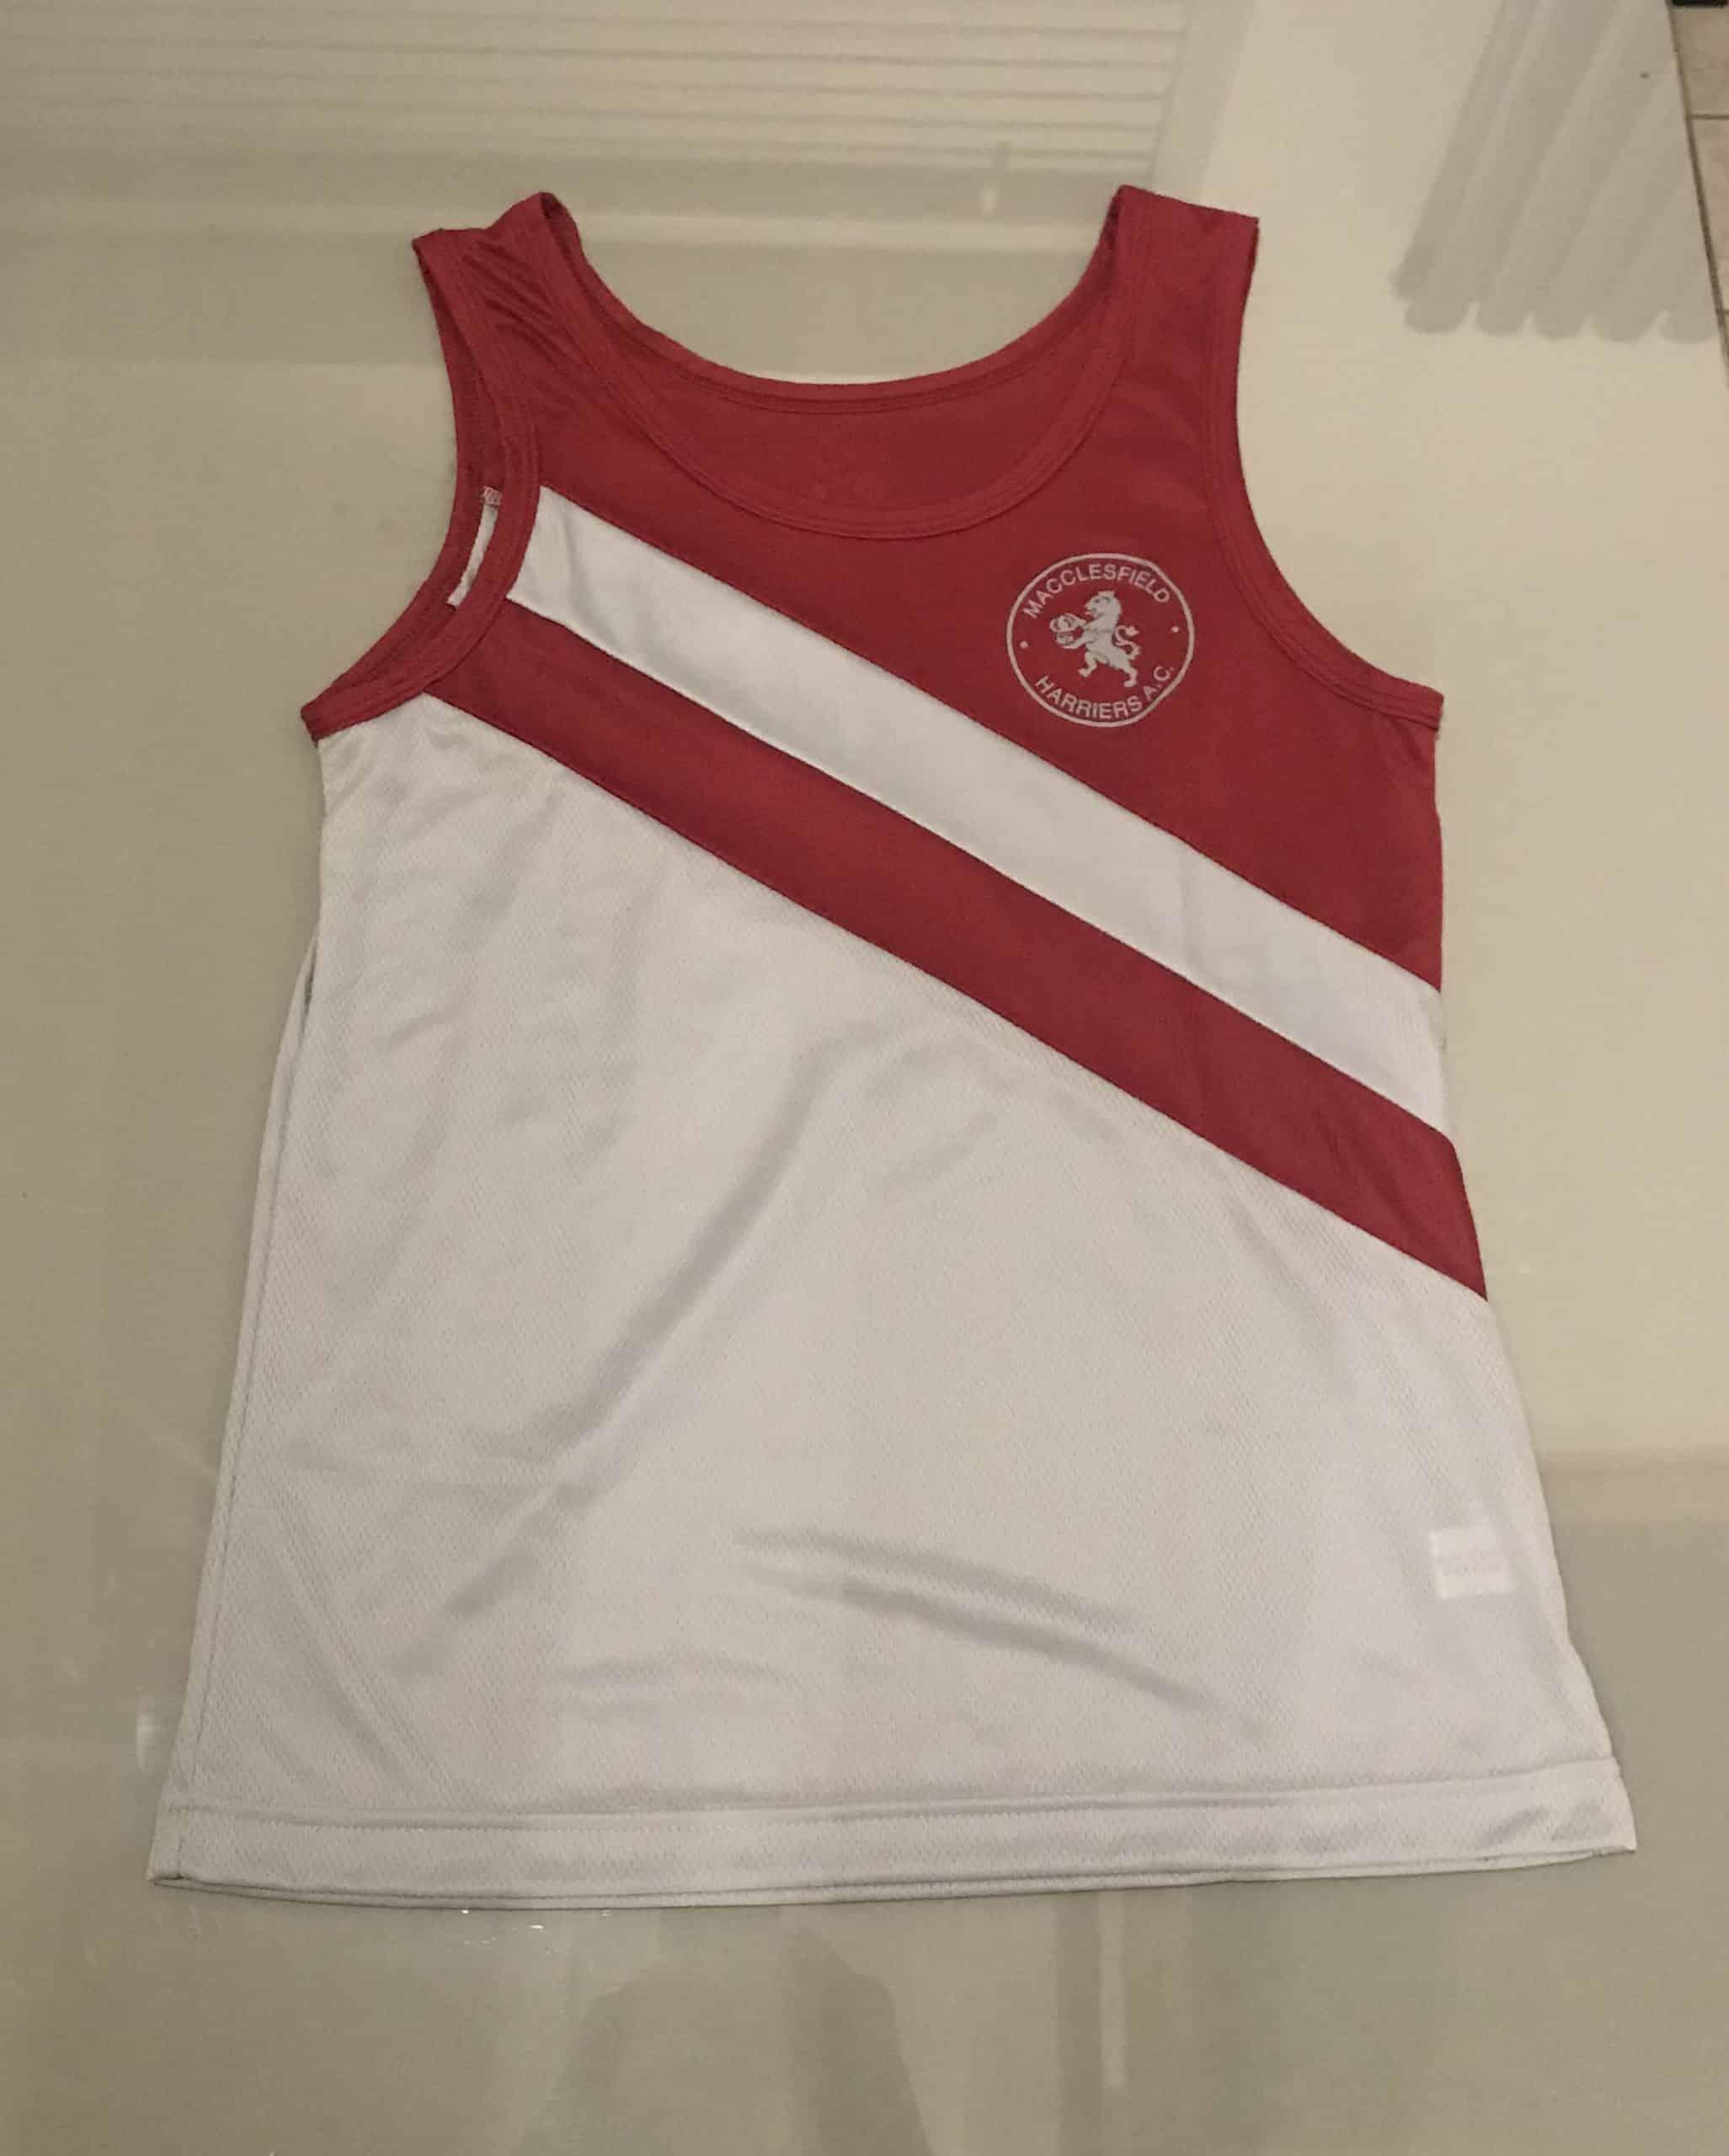 Macclesfield Harriers Club Vest